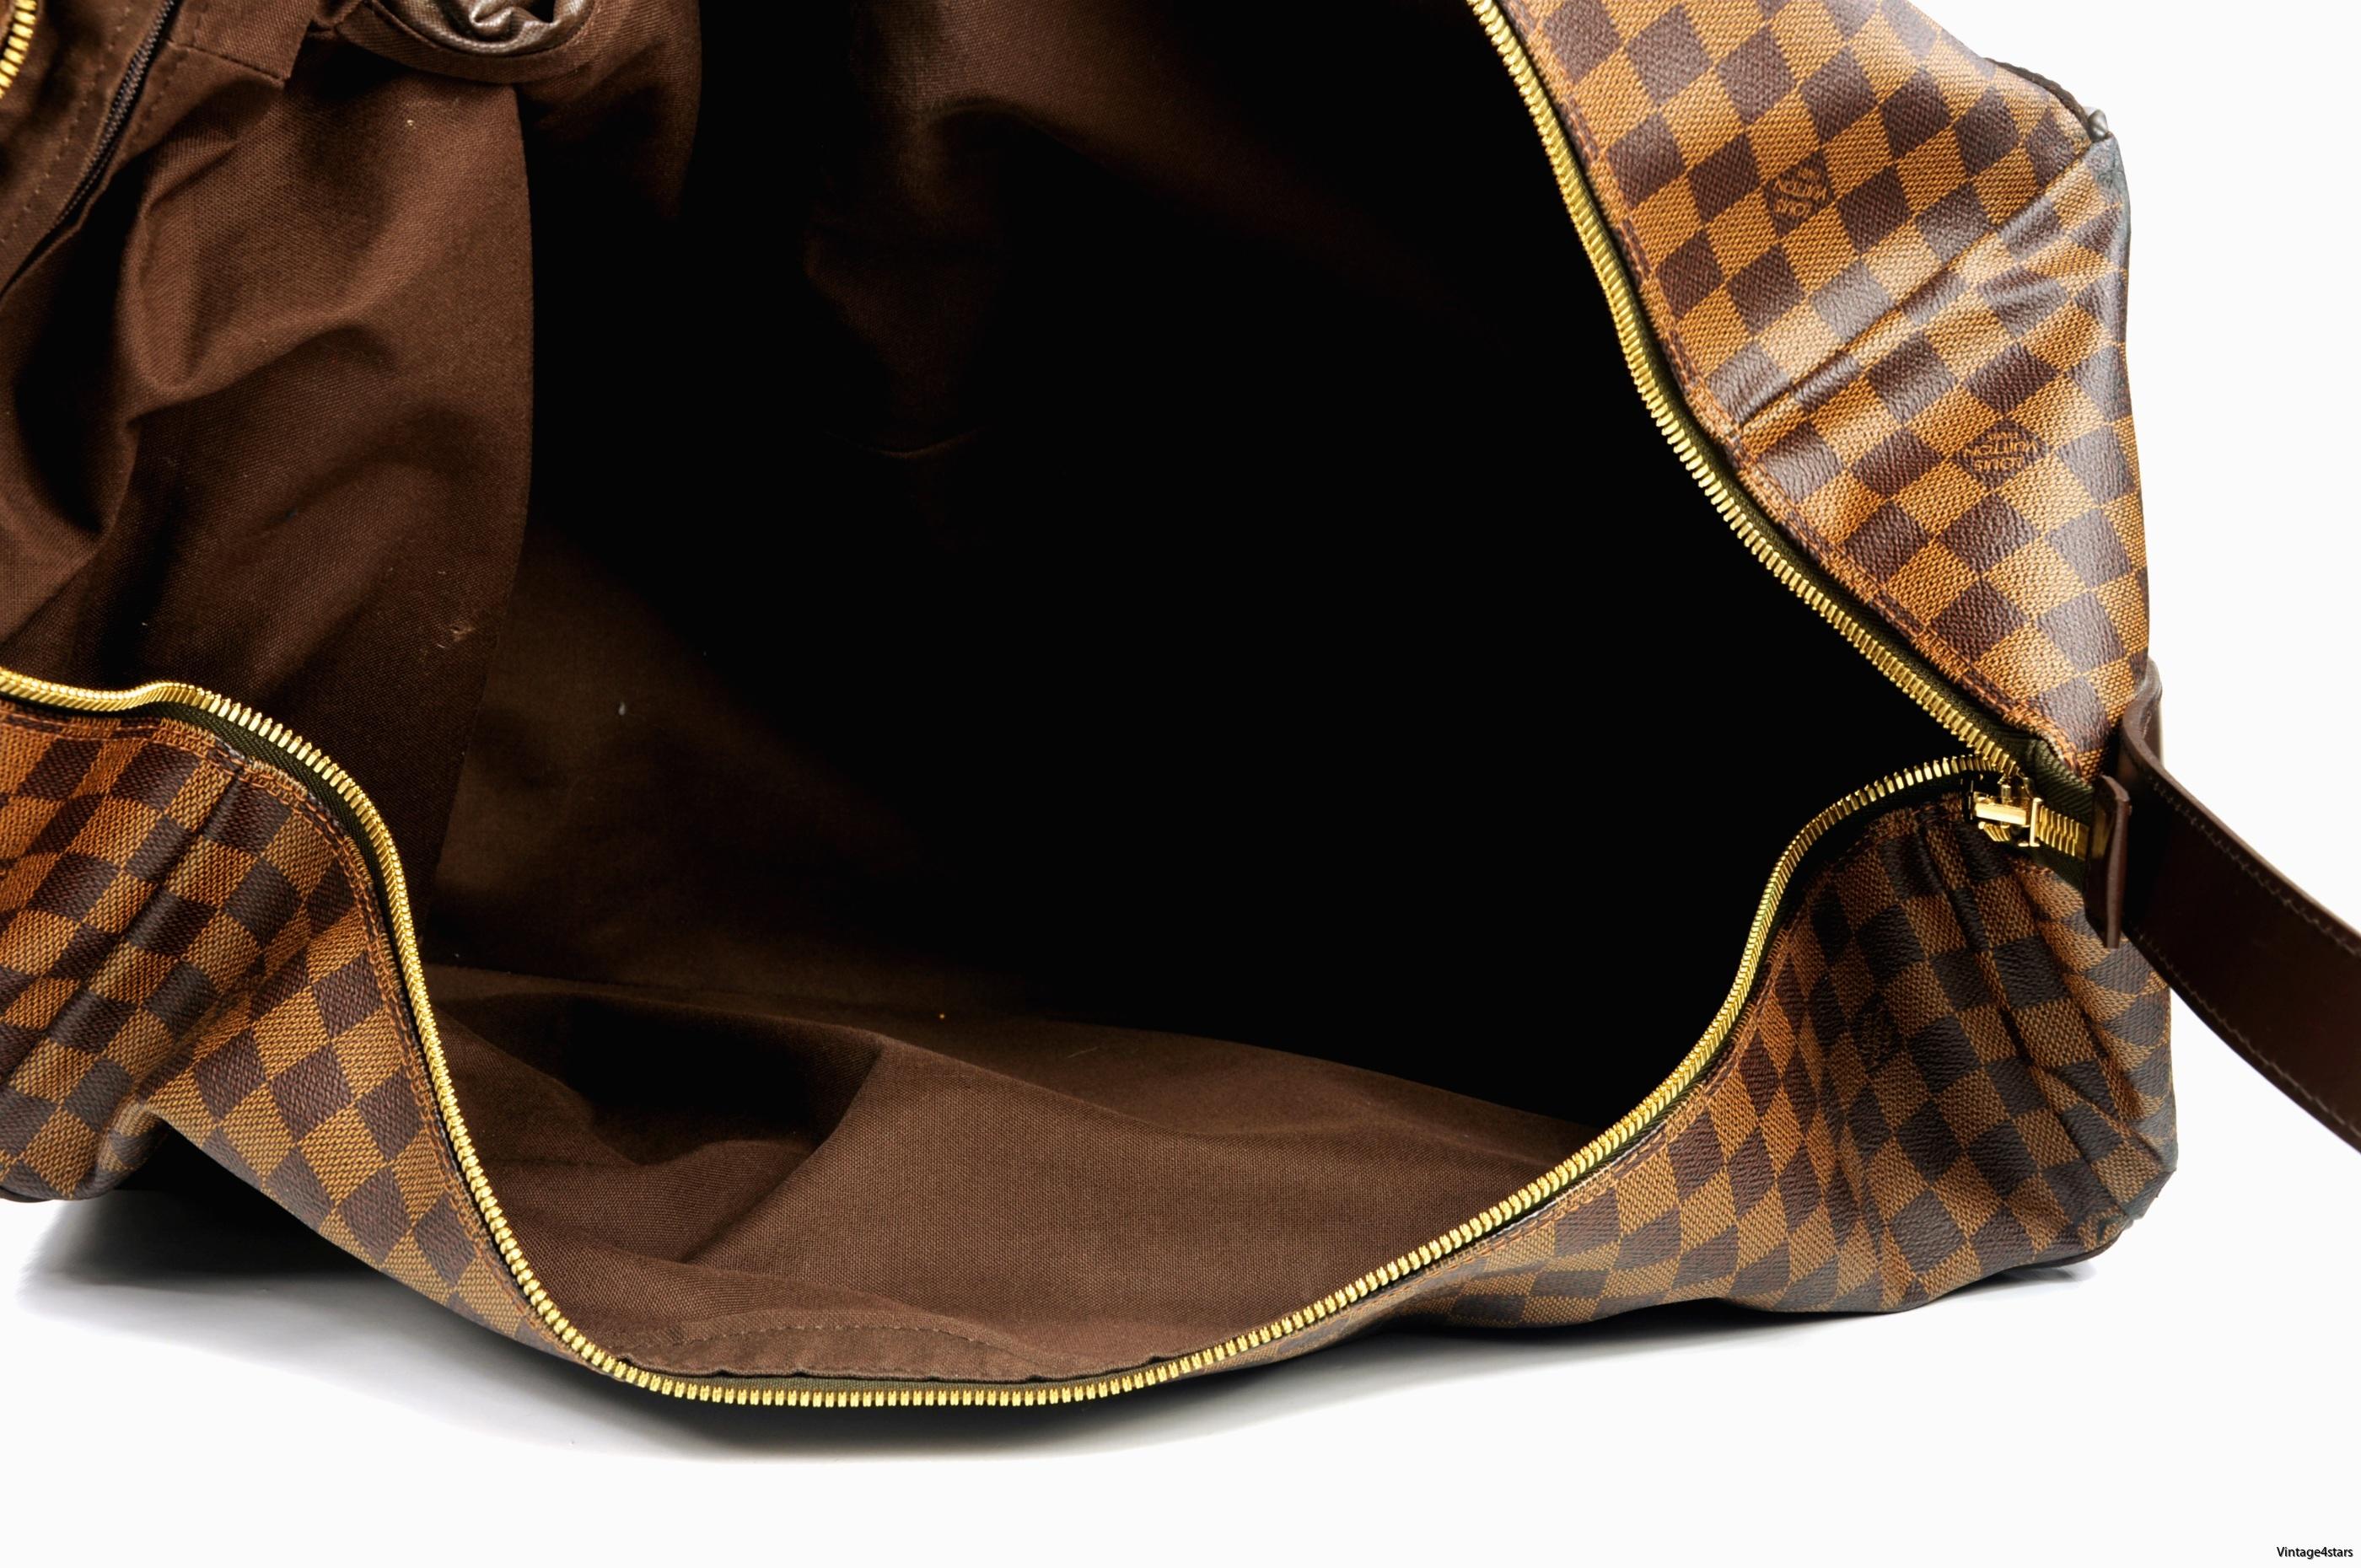 Louis Vuitton Eole 60 Damier Ebene 20